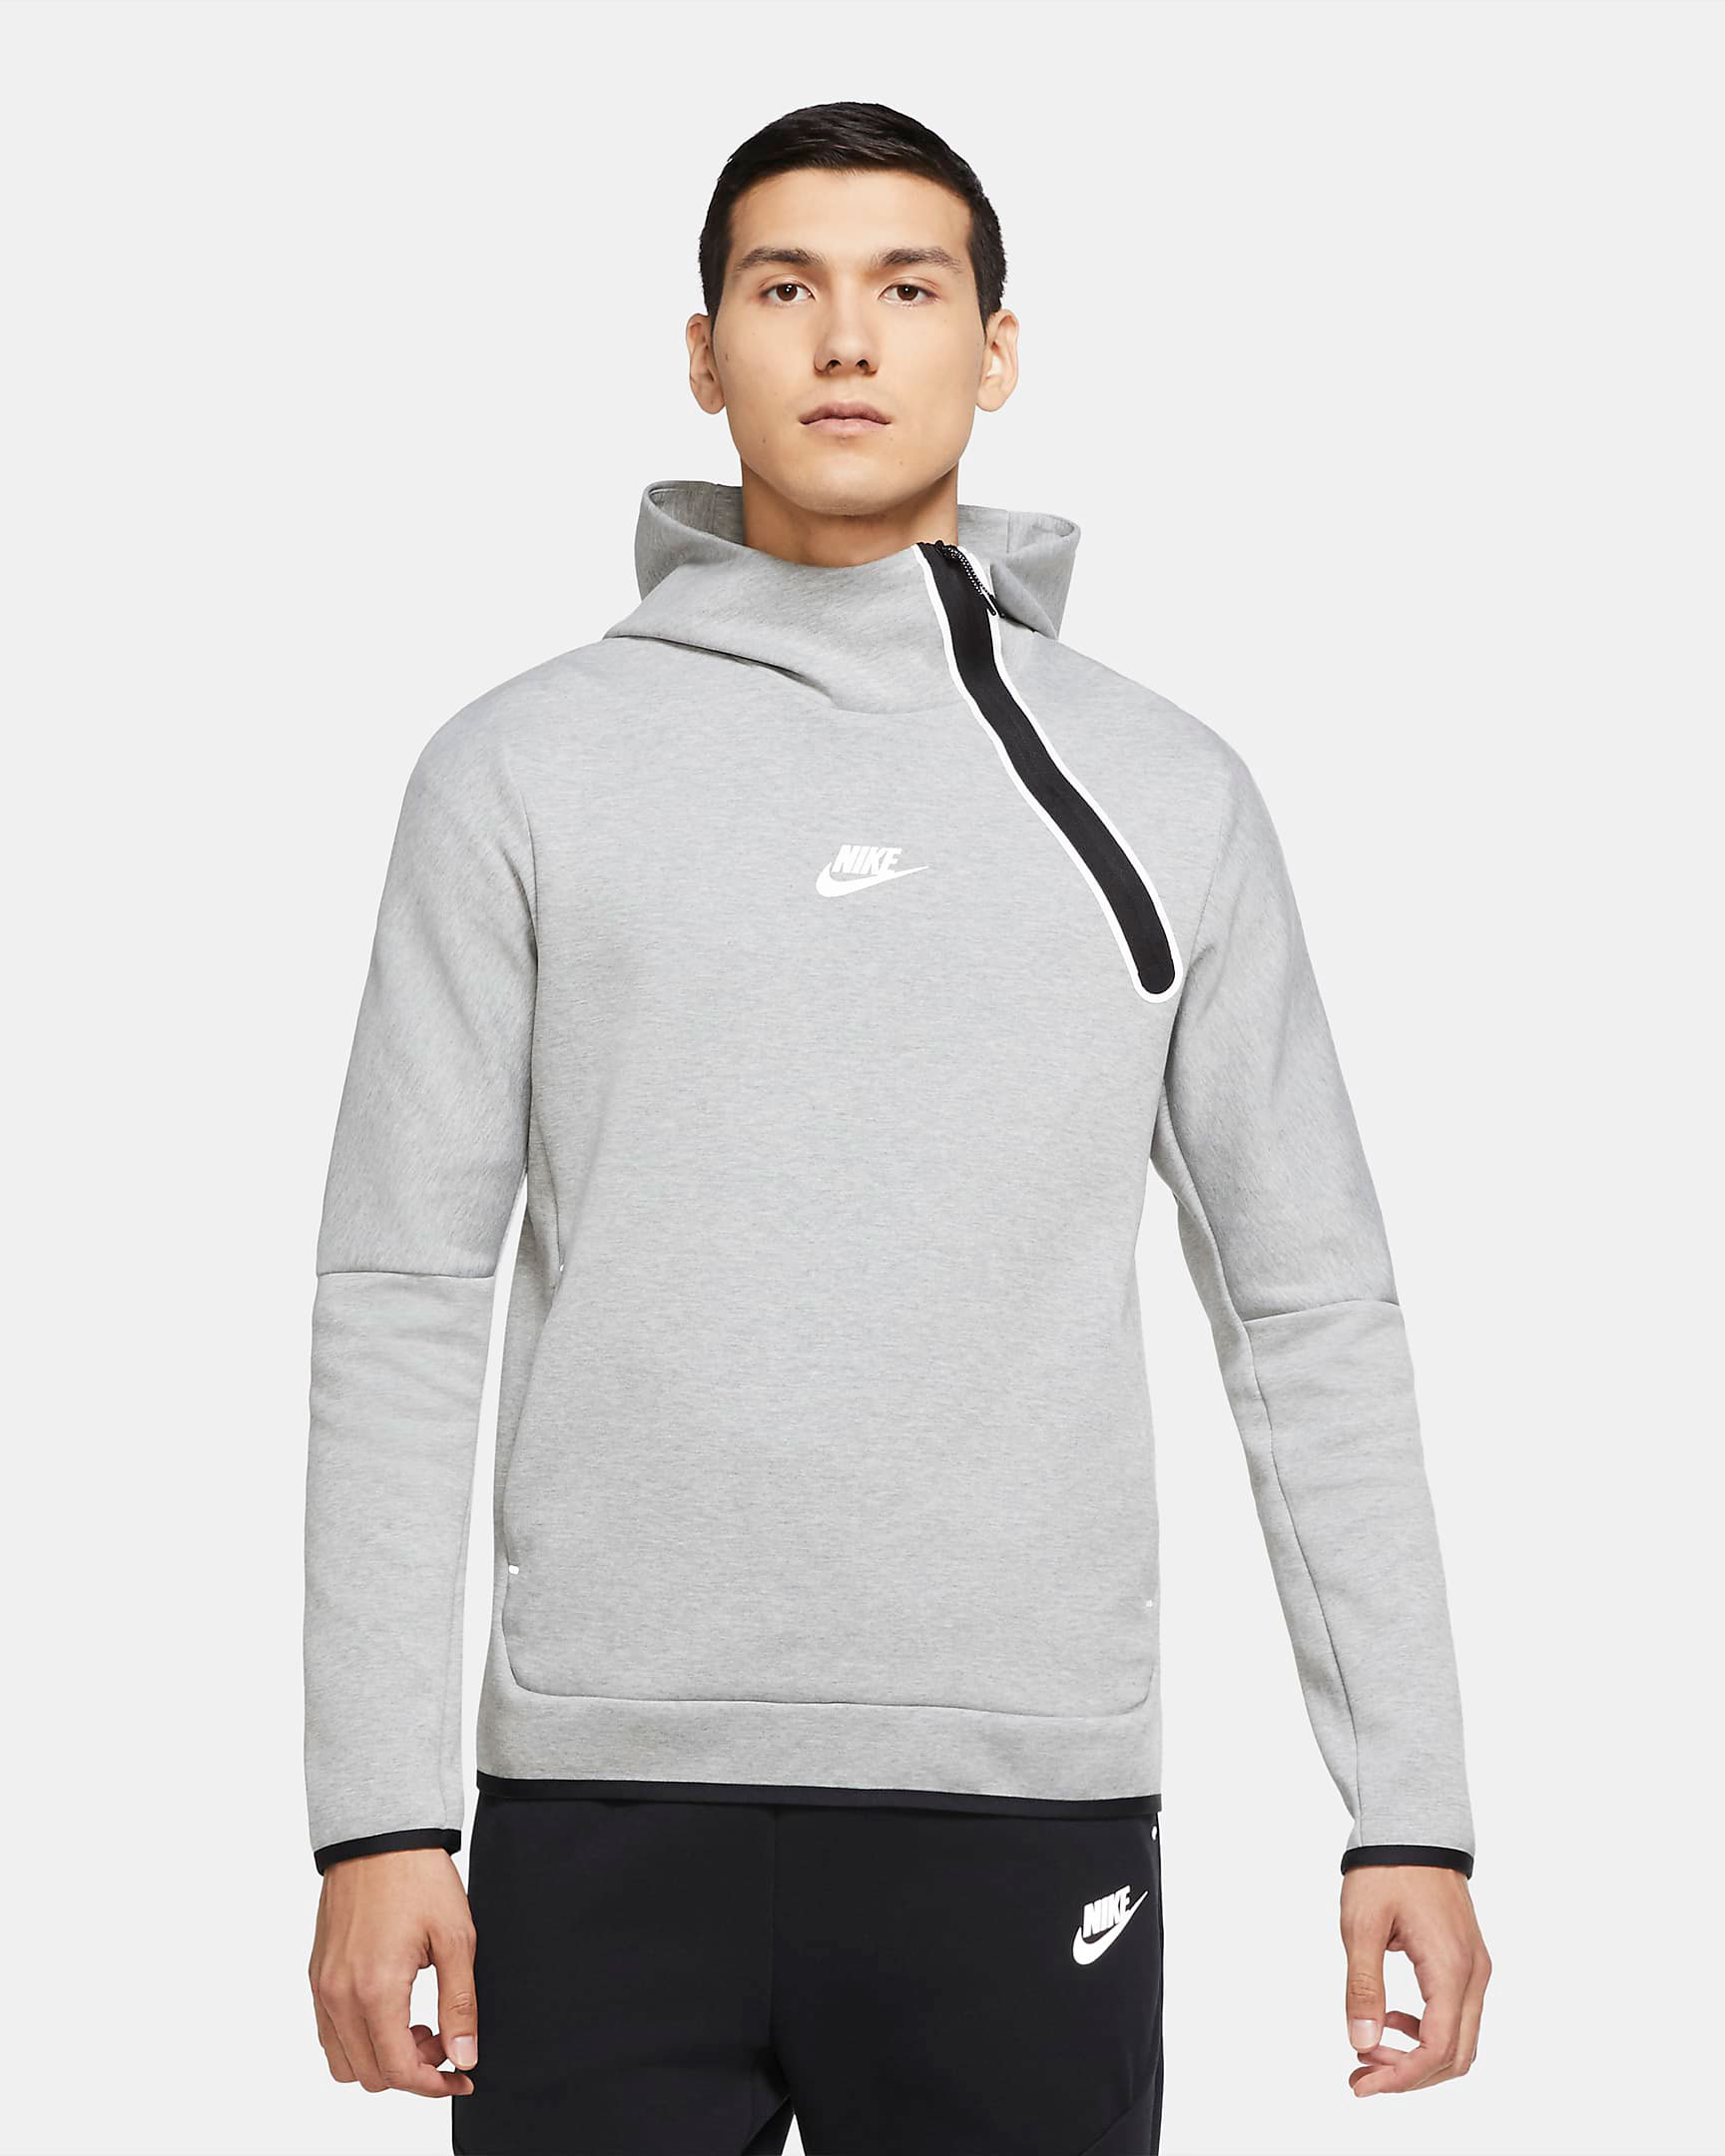 nike-air-max-95-neon-volt-grey-tech-fleece-hoodie-1